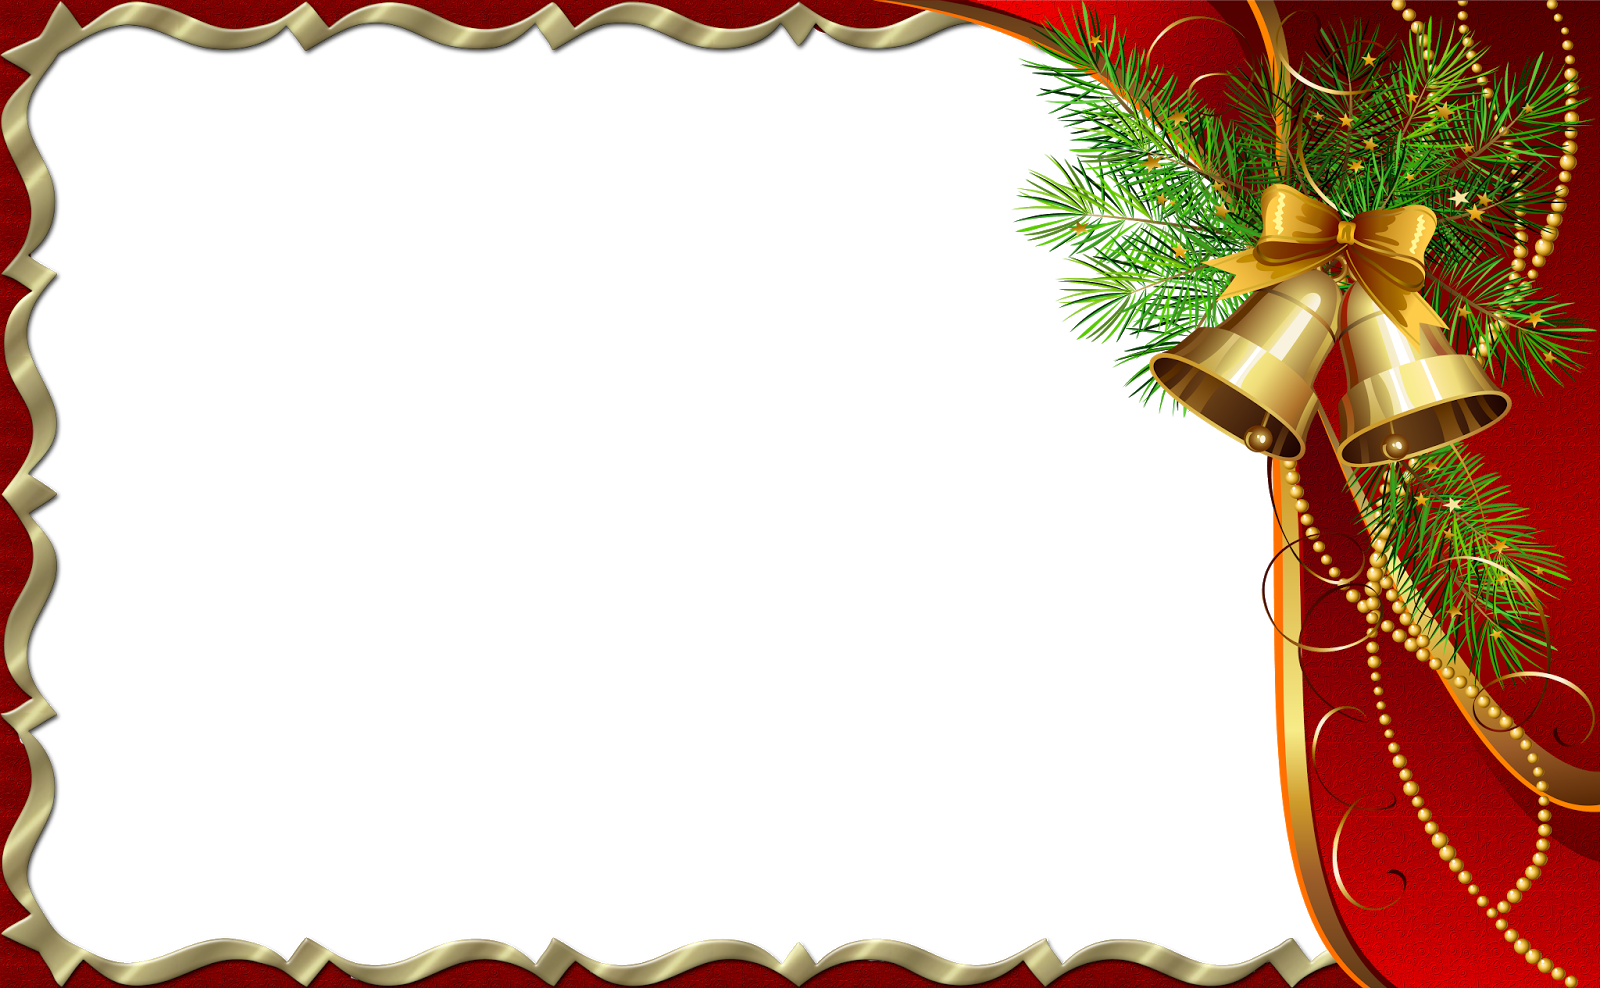 Marcos navideños en png | Arte digital | Bordes | Pinterest | Marcos ...